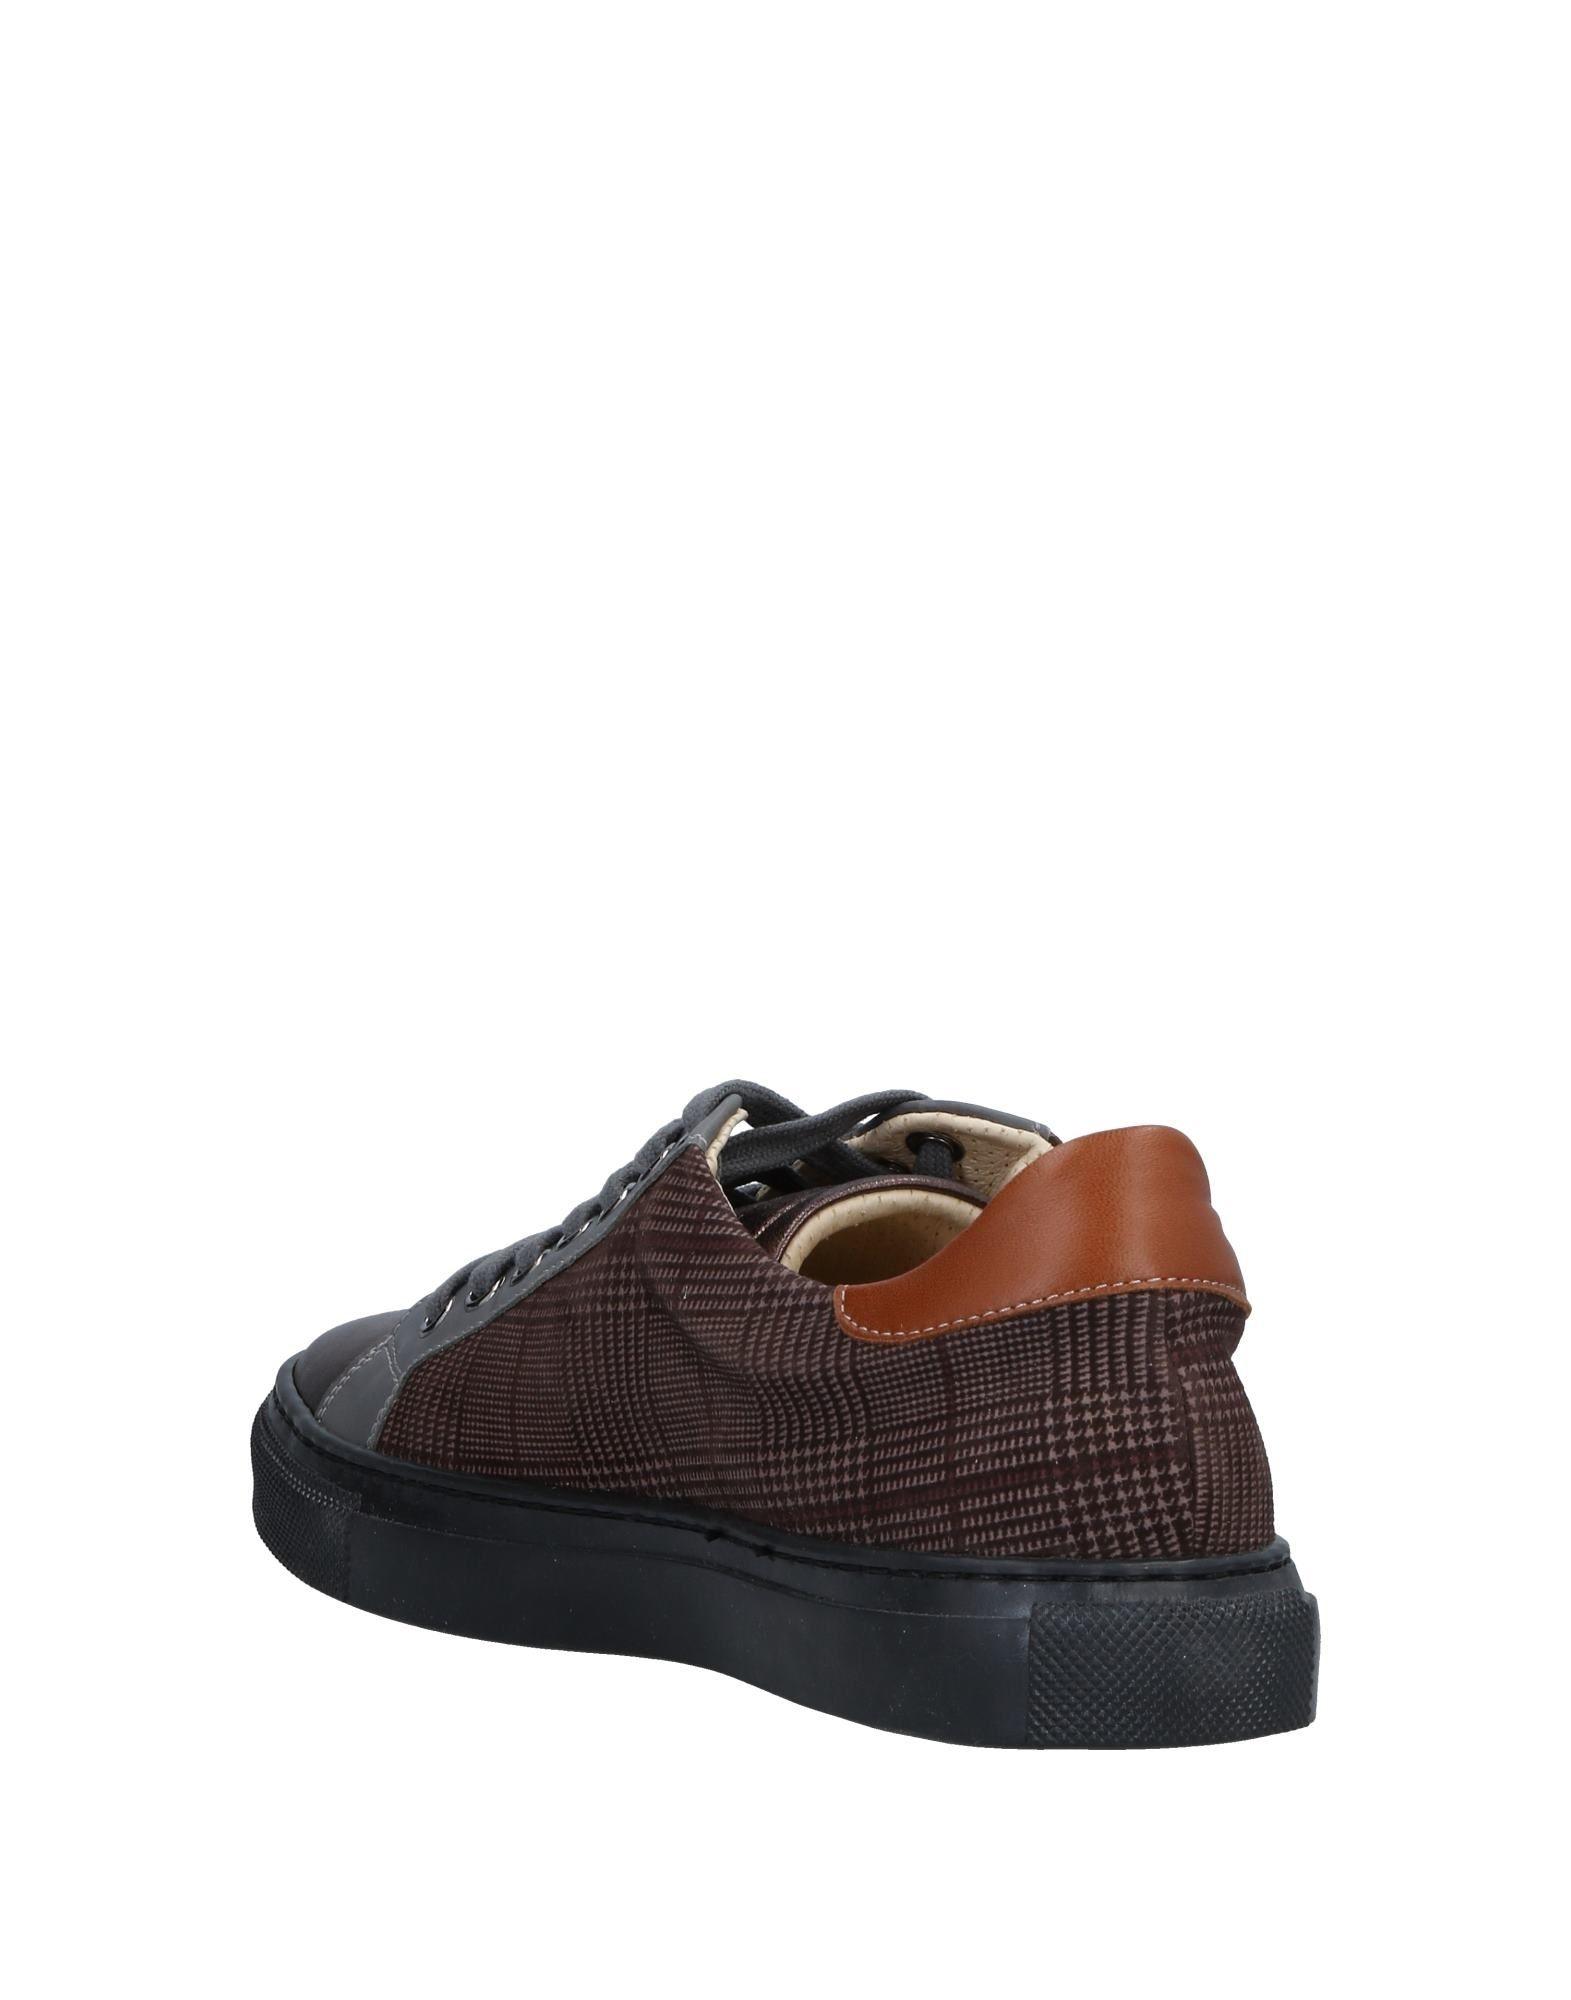 Ebarrito Sneakers 11519373FS Damen  11519373FS Sneakers Gute Qualität beliebte Schuhe 71dc94